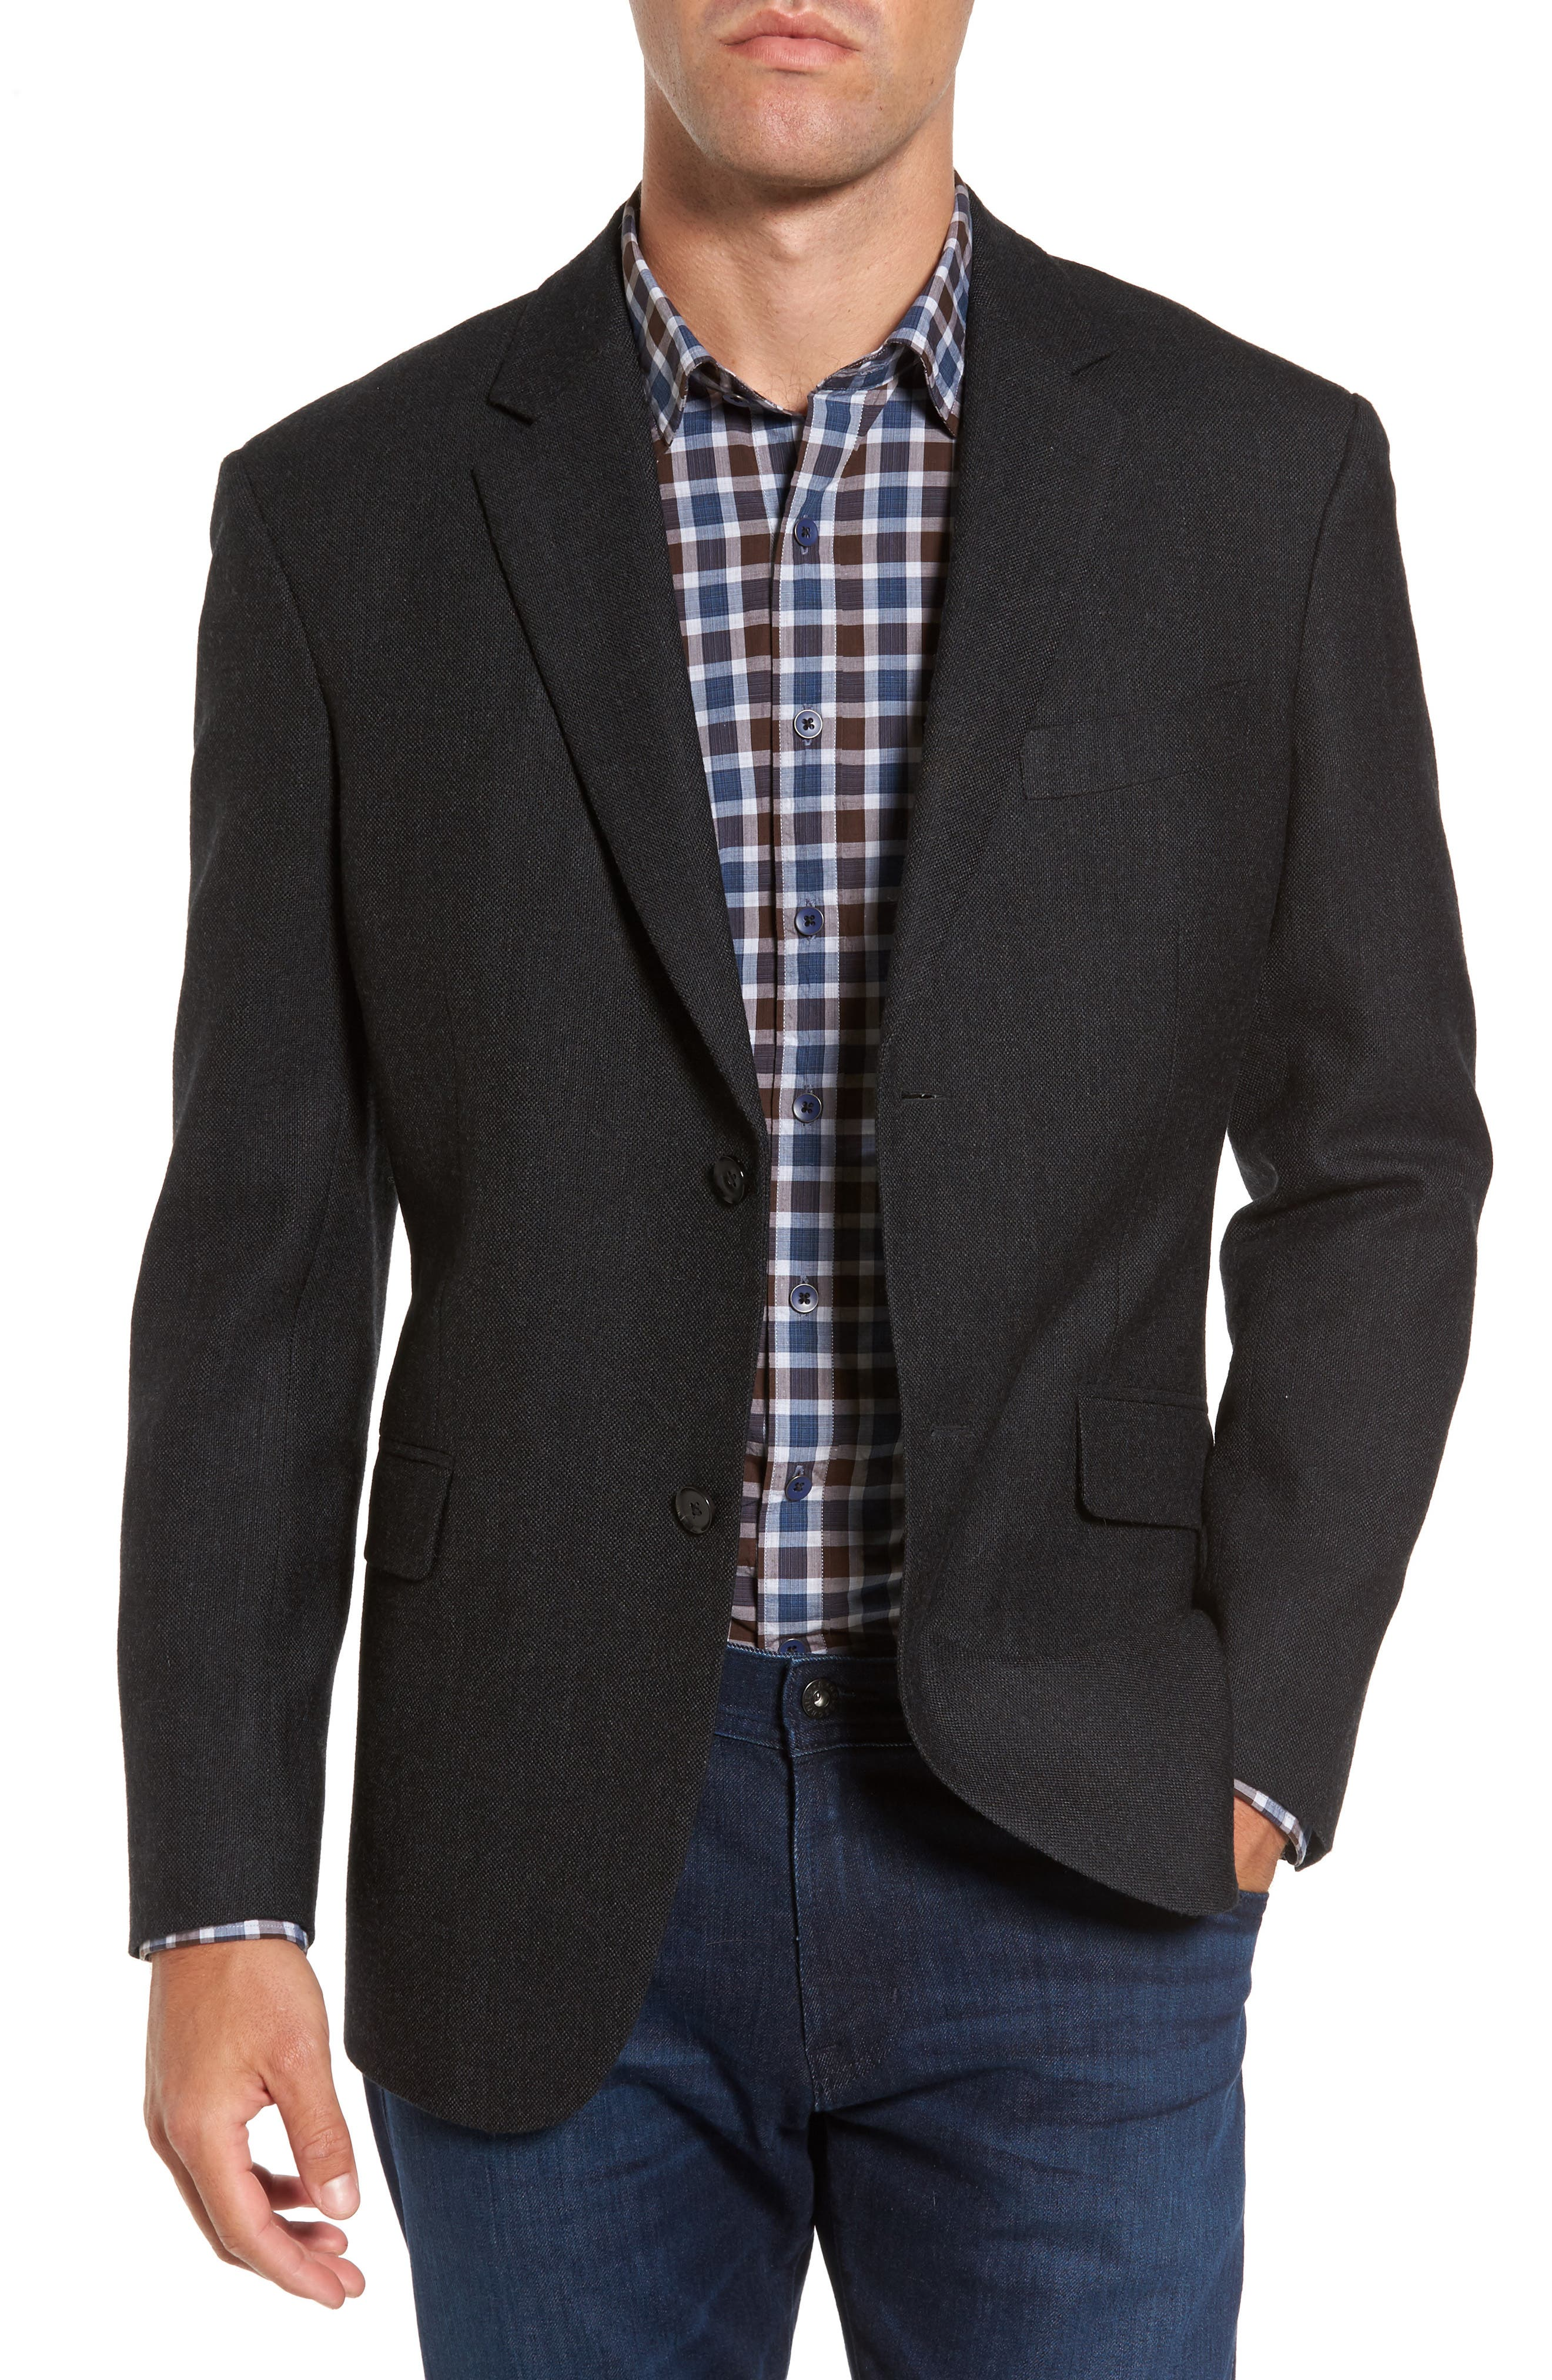 Alternate Image 1 Selected - Rodd & Gunn Slingsby Virgin Wool Sport Coat